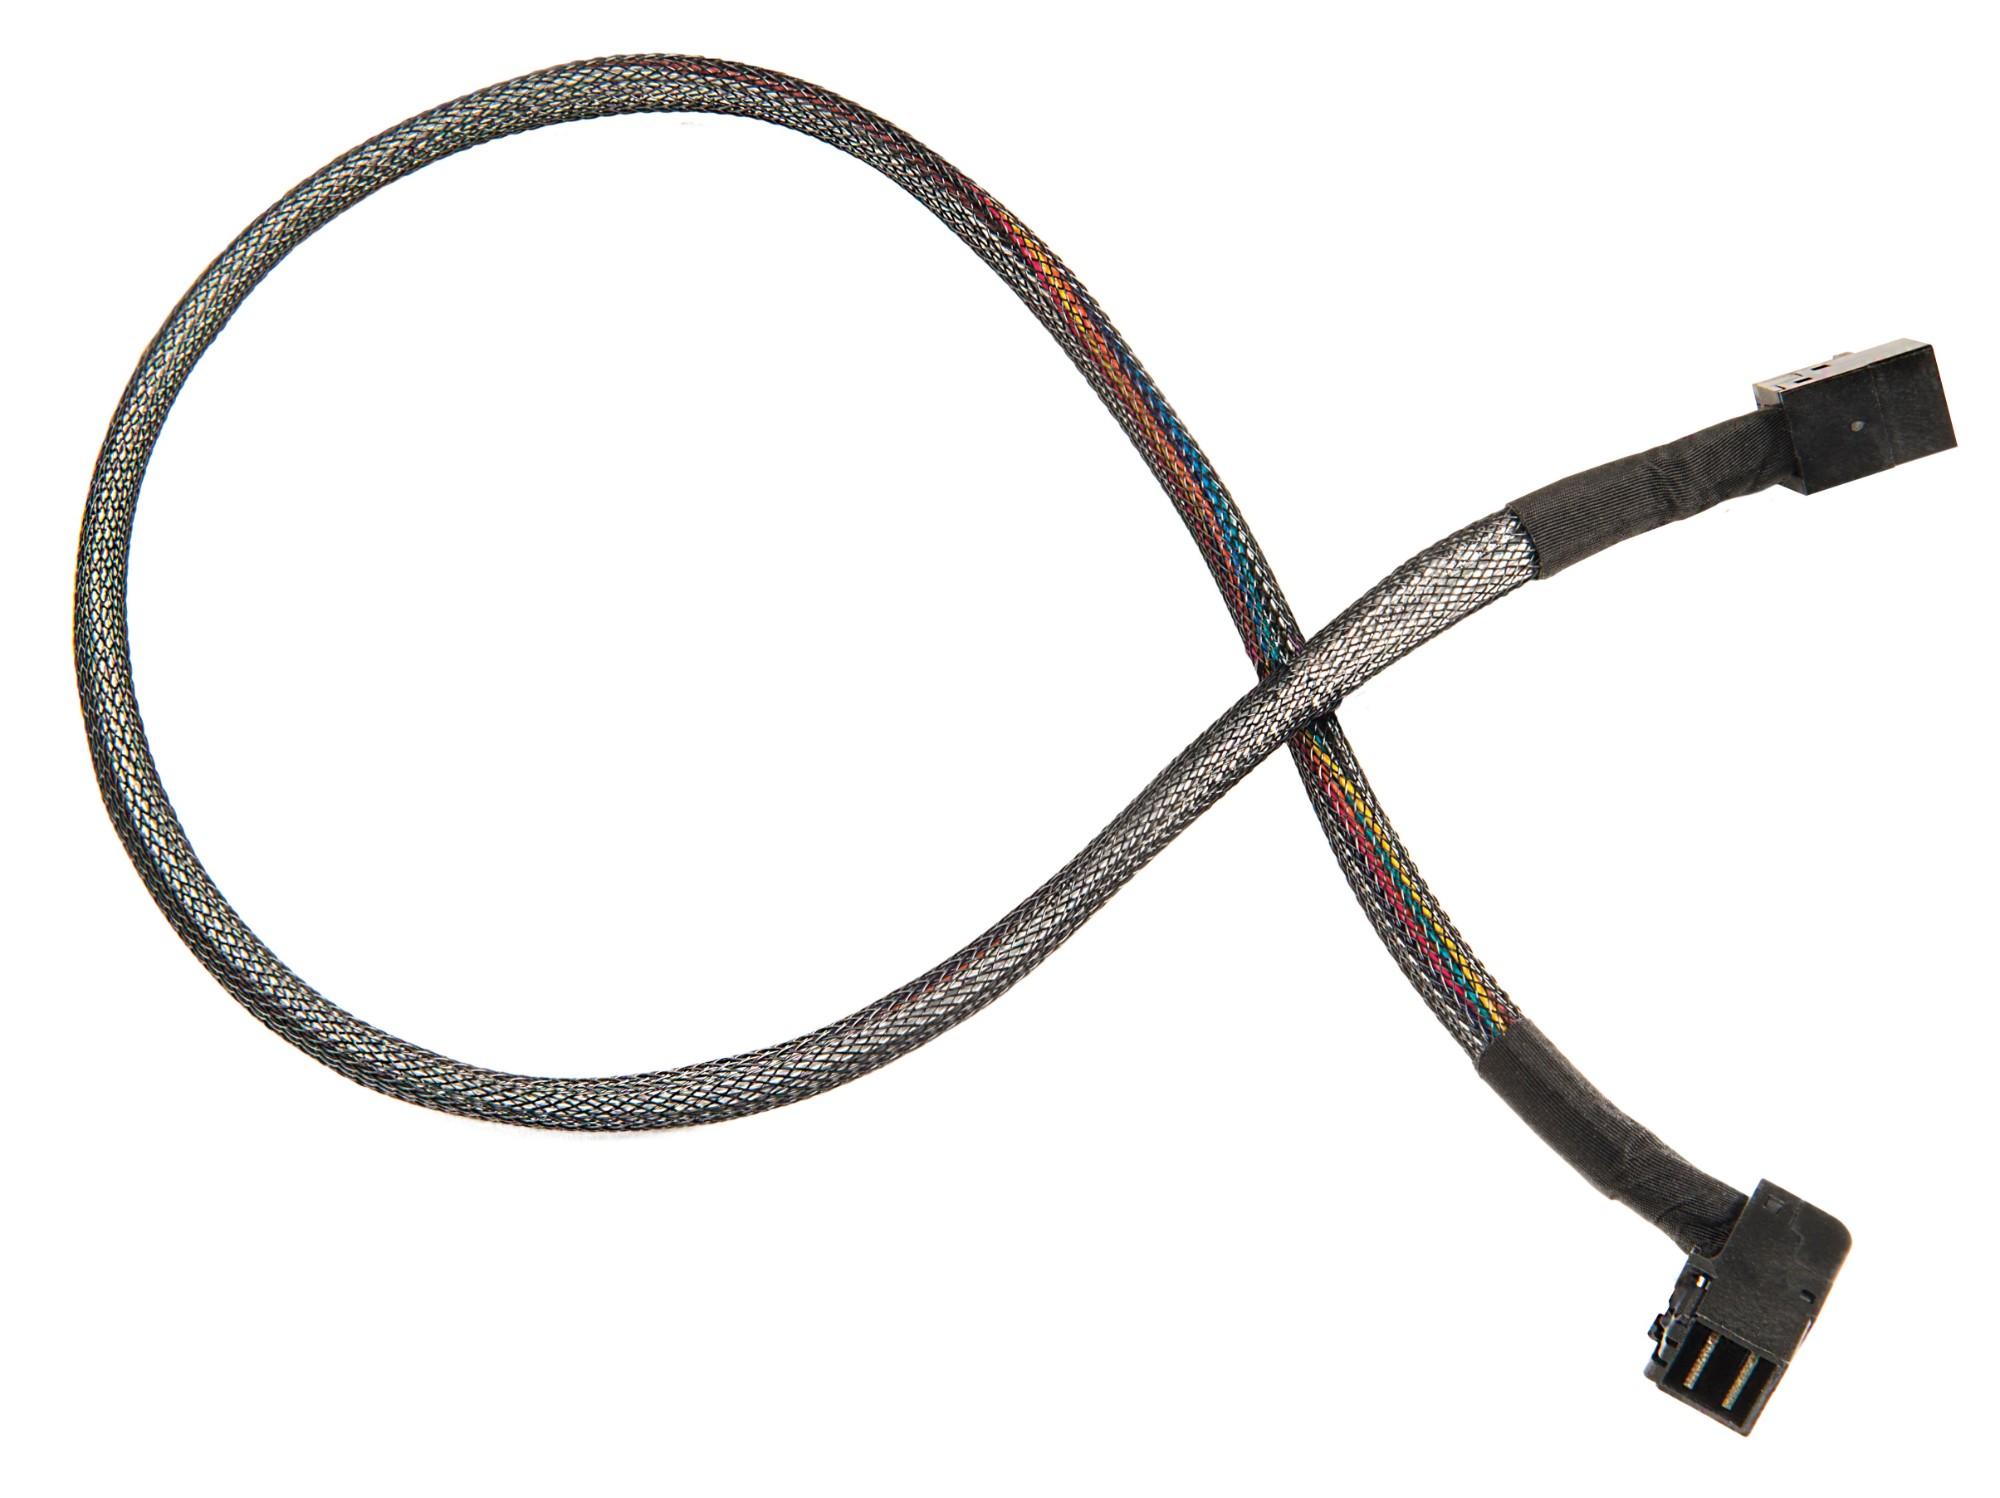 Microsemi ADAPTEC I-RA-HDMSAS-HDMSAS-1M 12 Gbit/s Black